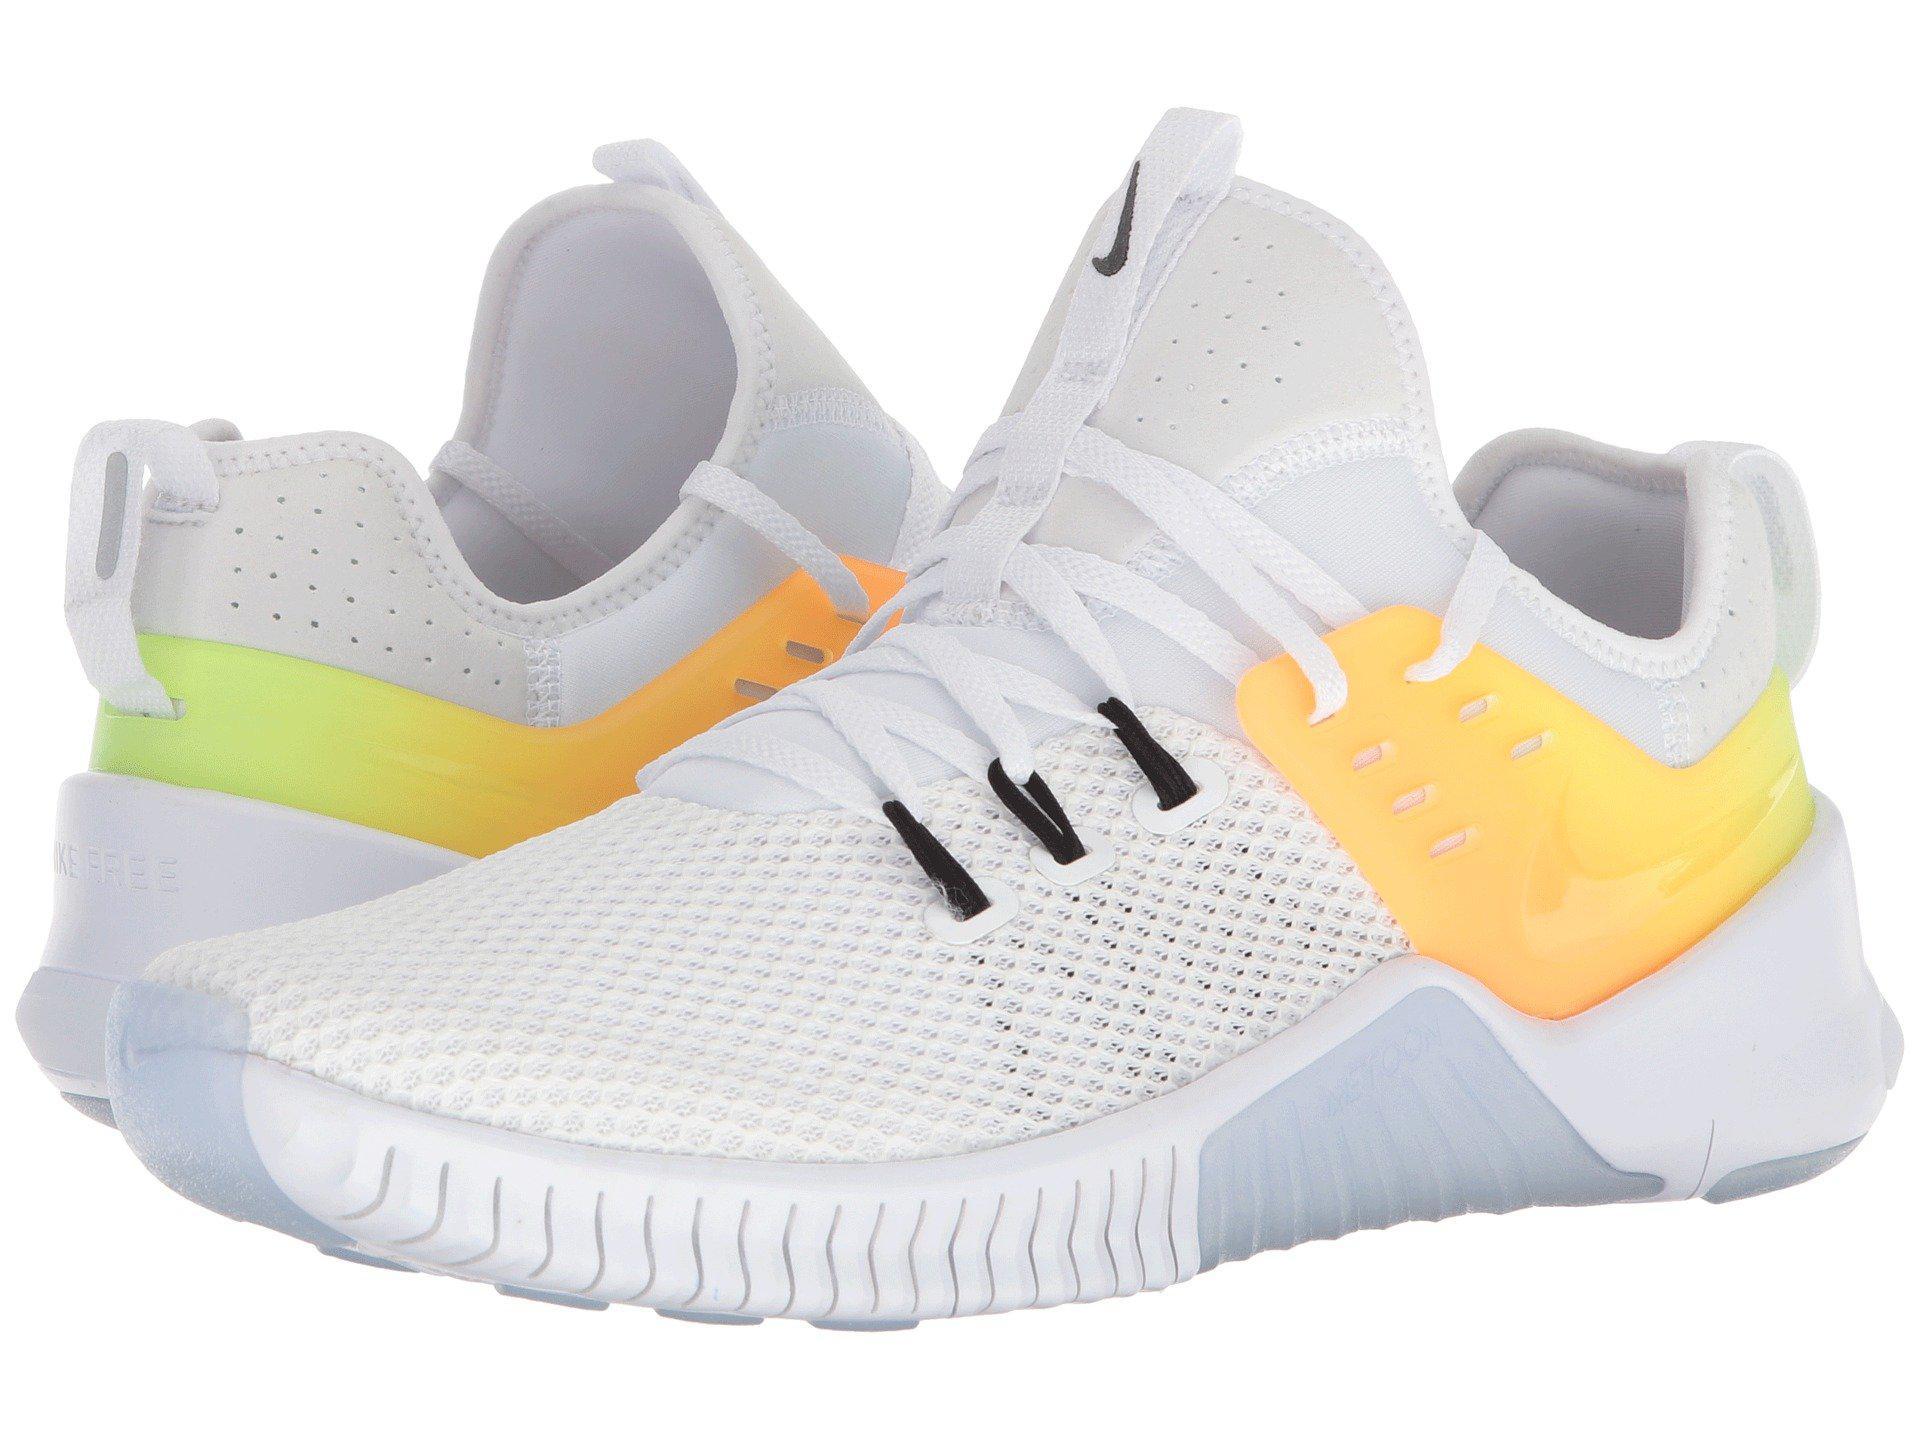 7850e0ba7347 Lyst - Nike Metcon Free in White for Men - Save 35%